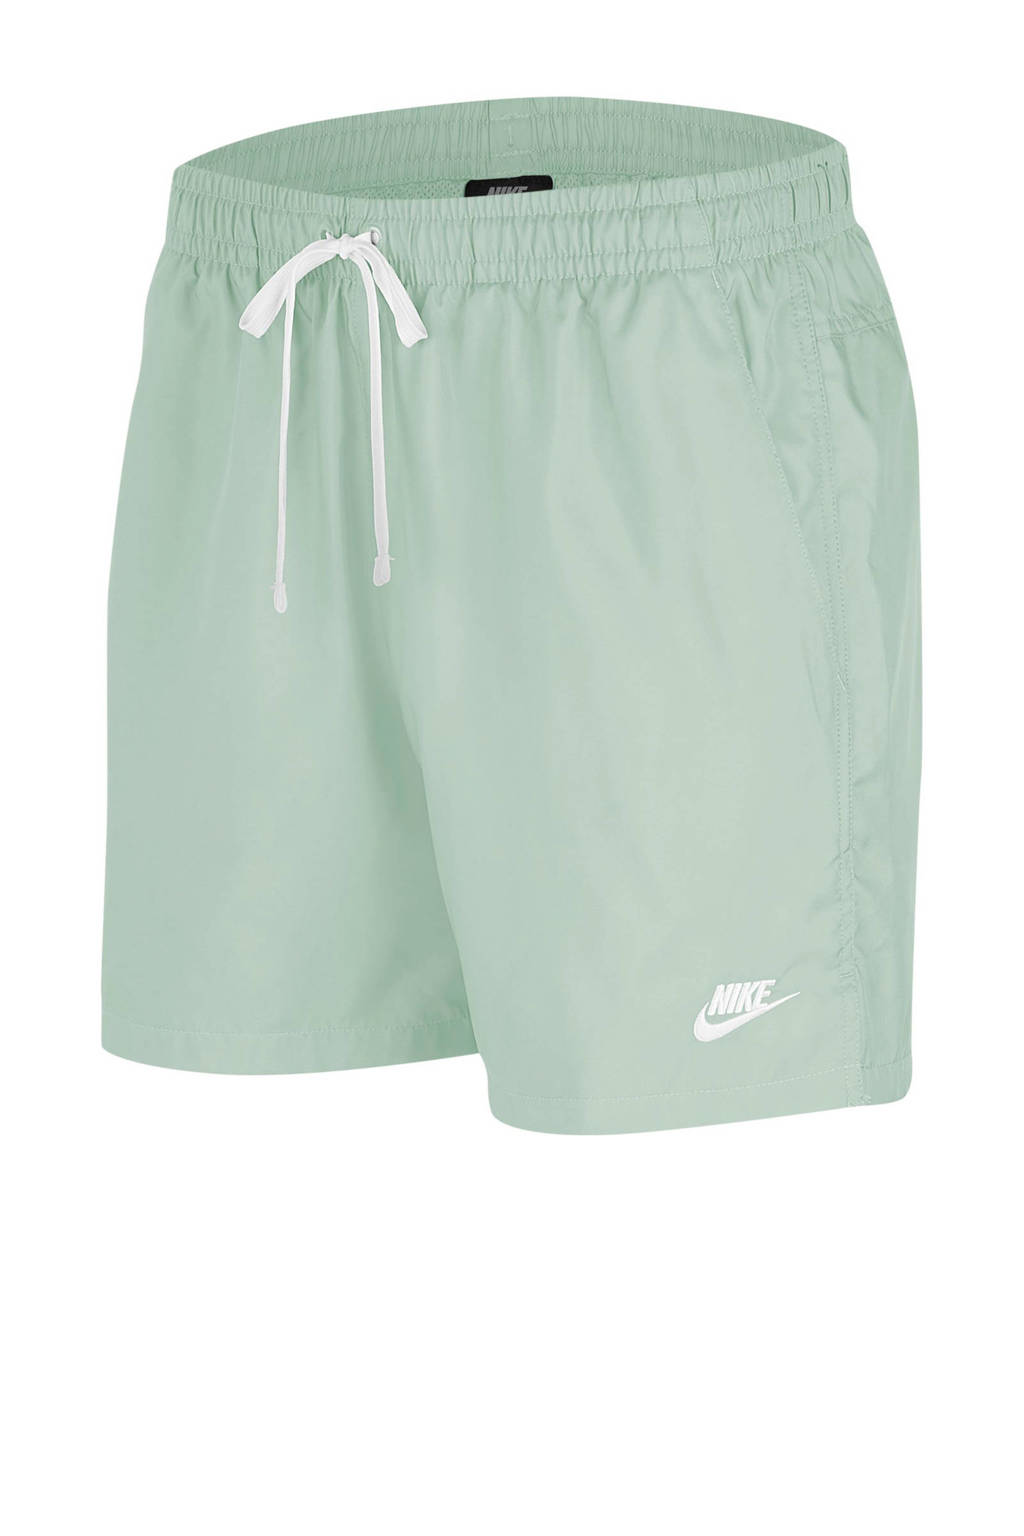 Nike short mintgroen, Mintgroen